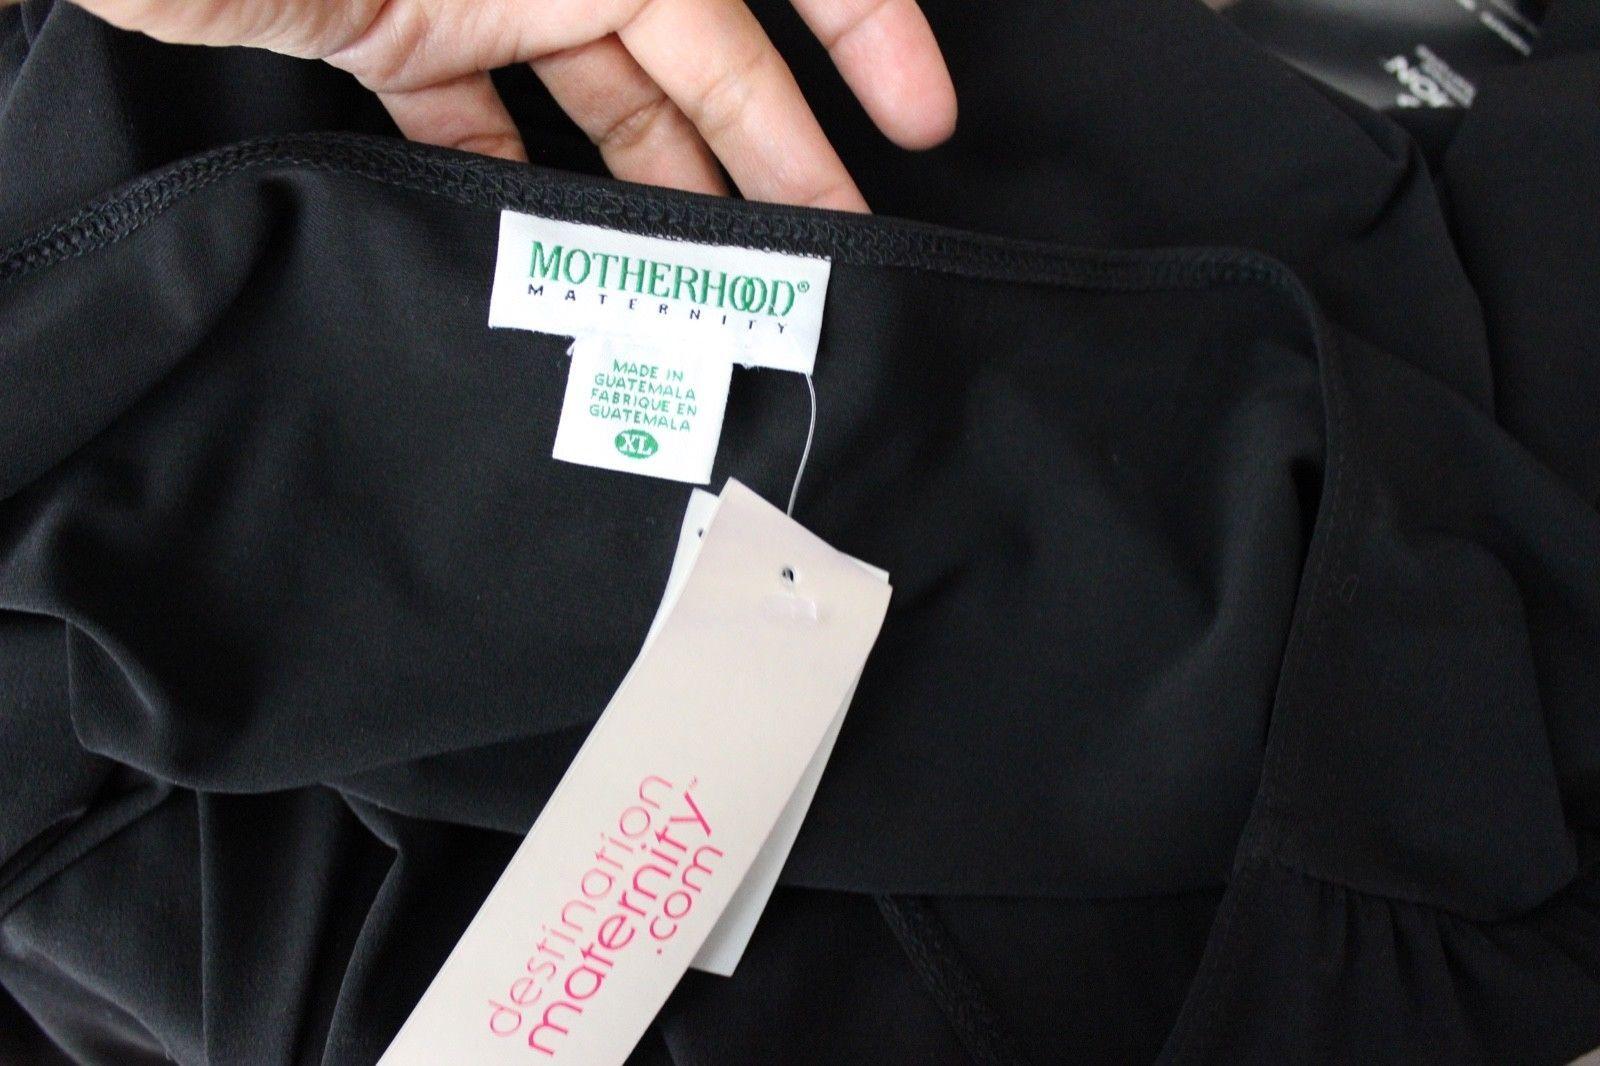 Motherhood maternity dress polyester stretch career black size XL